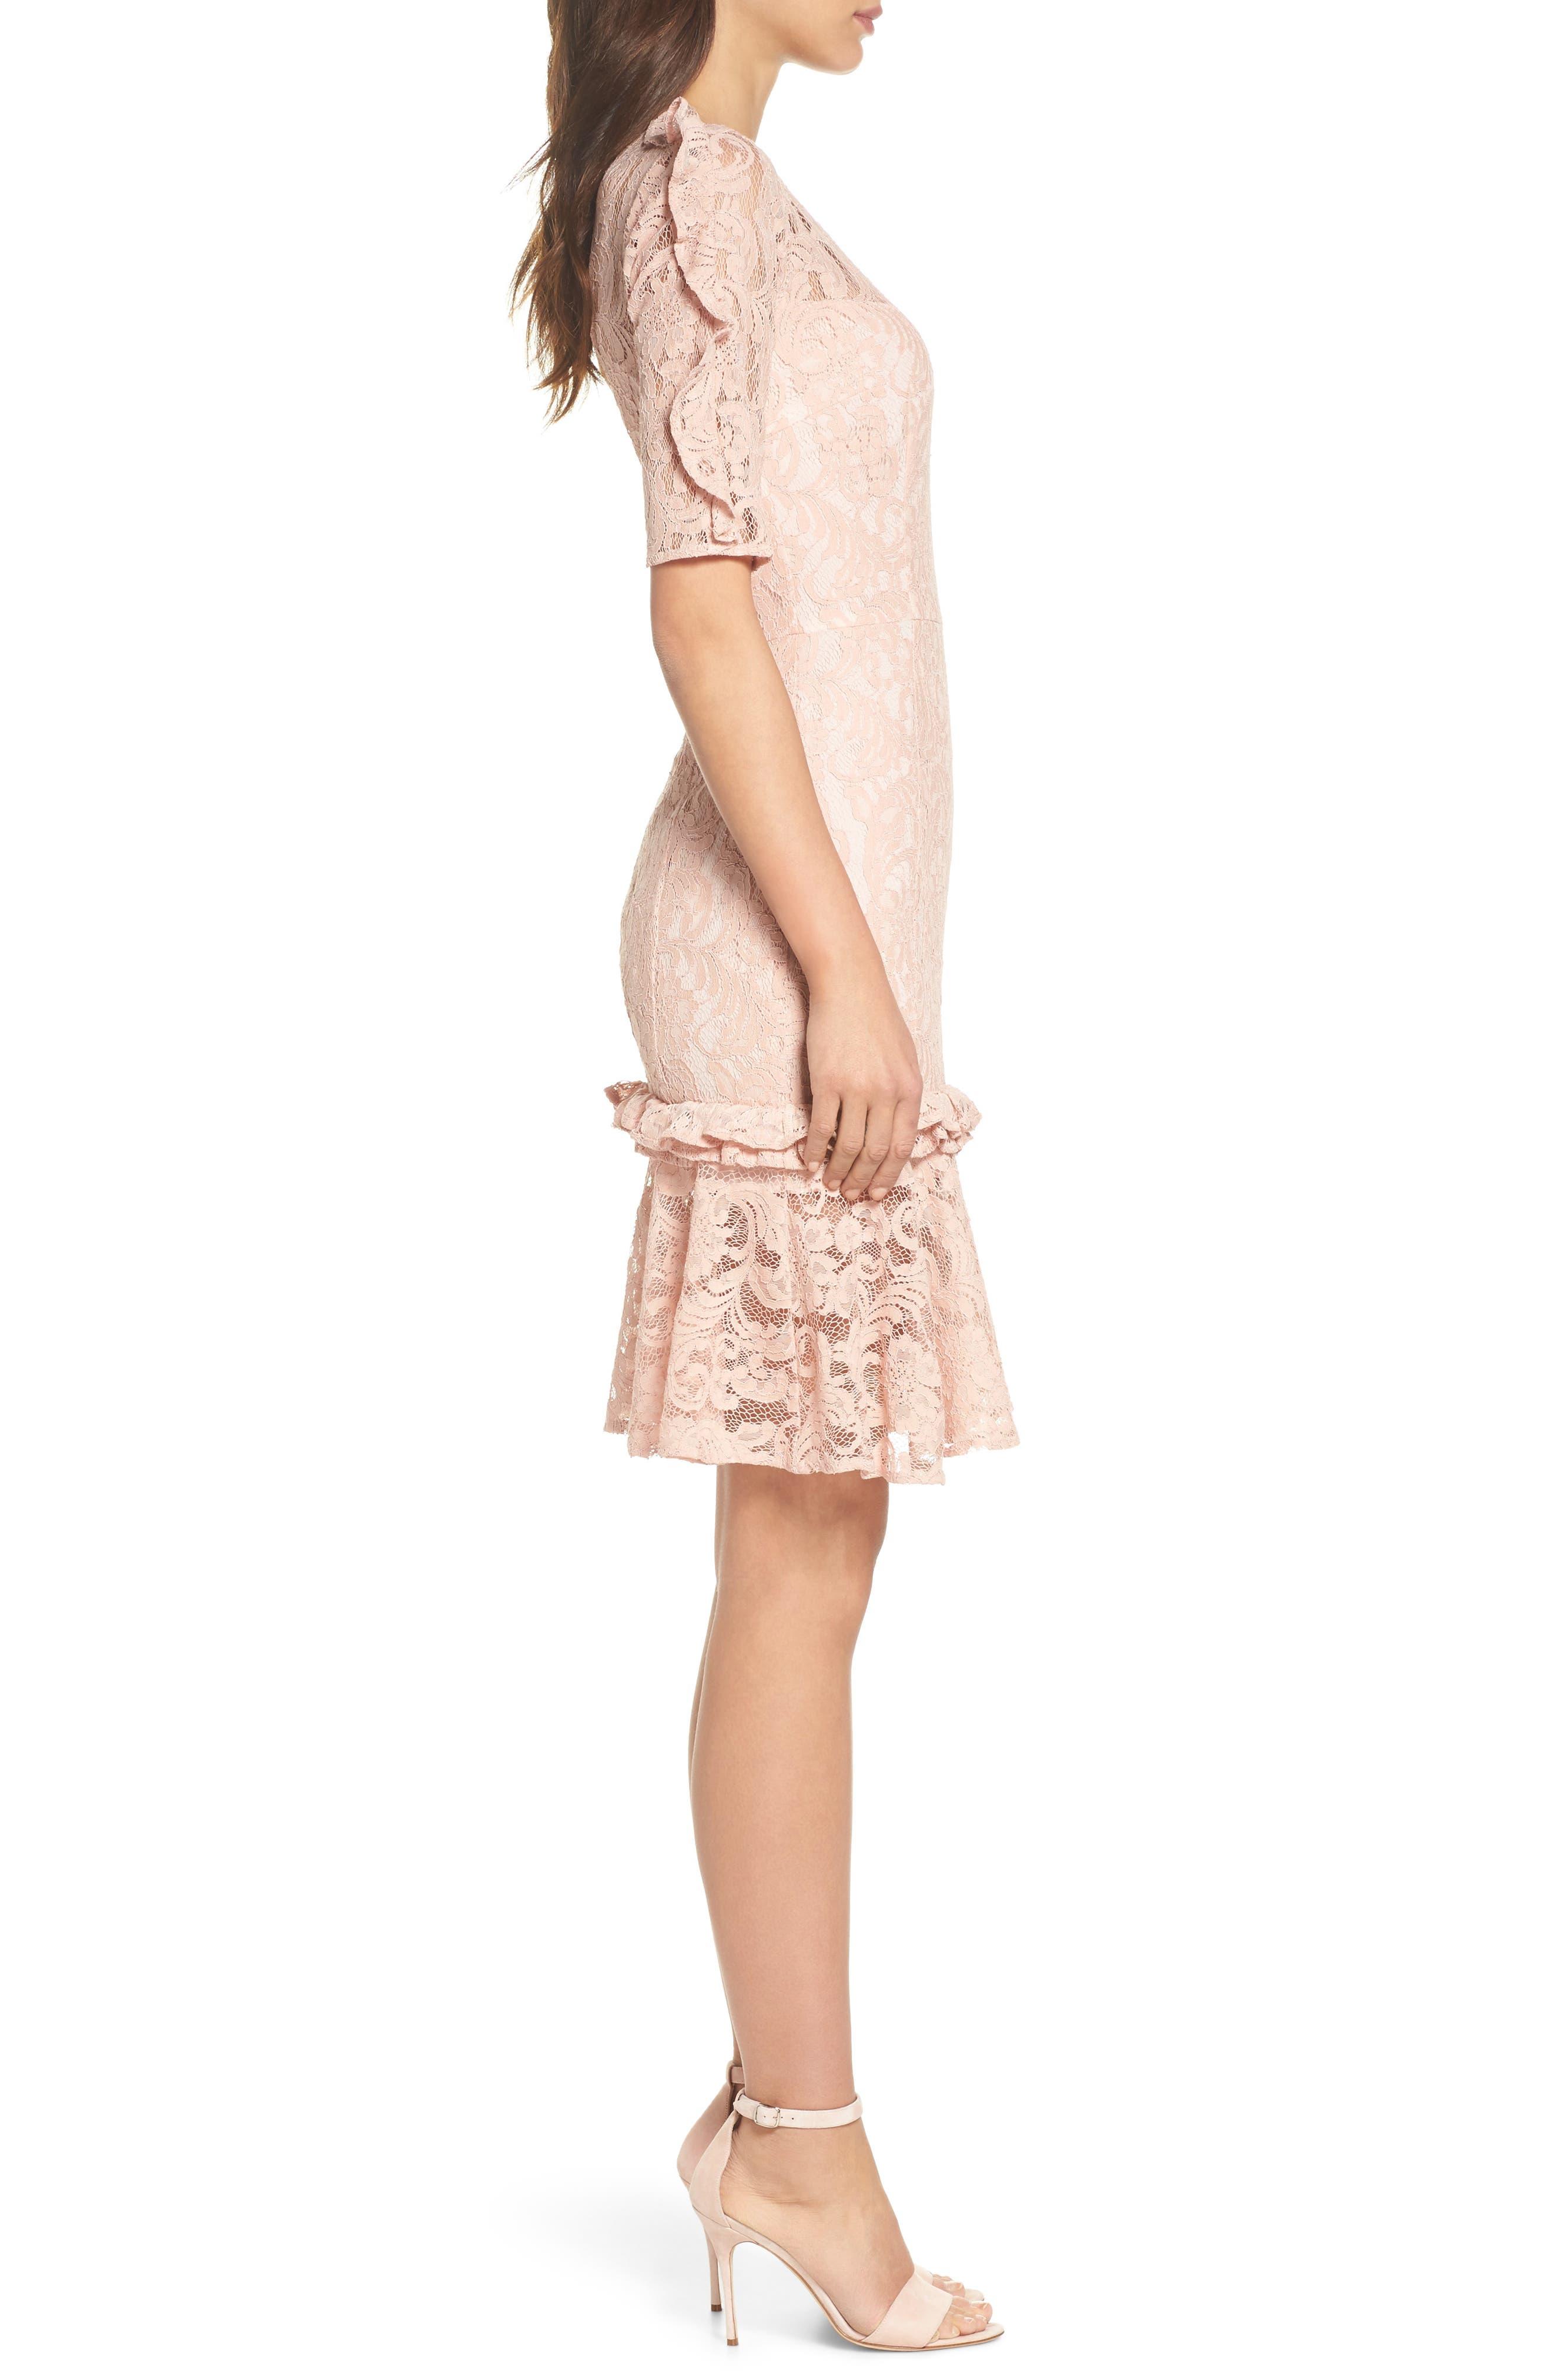 Hushed Dove Lace Dress,                             Alternate thumbnail 3, color,                             Rose Cloud